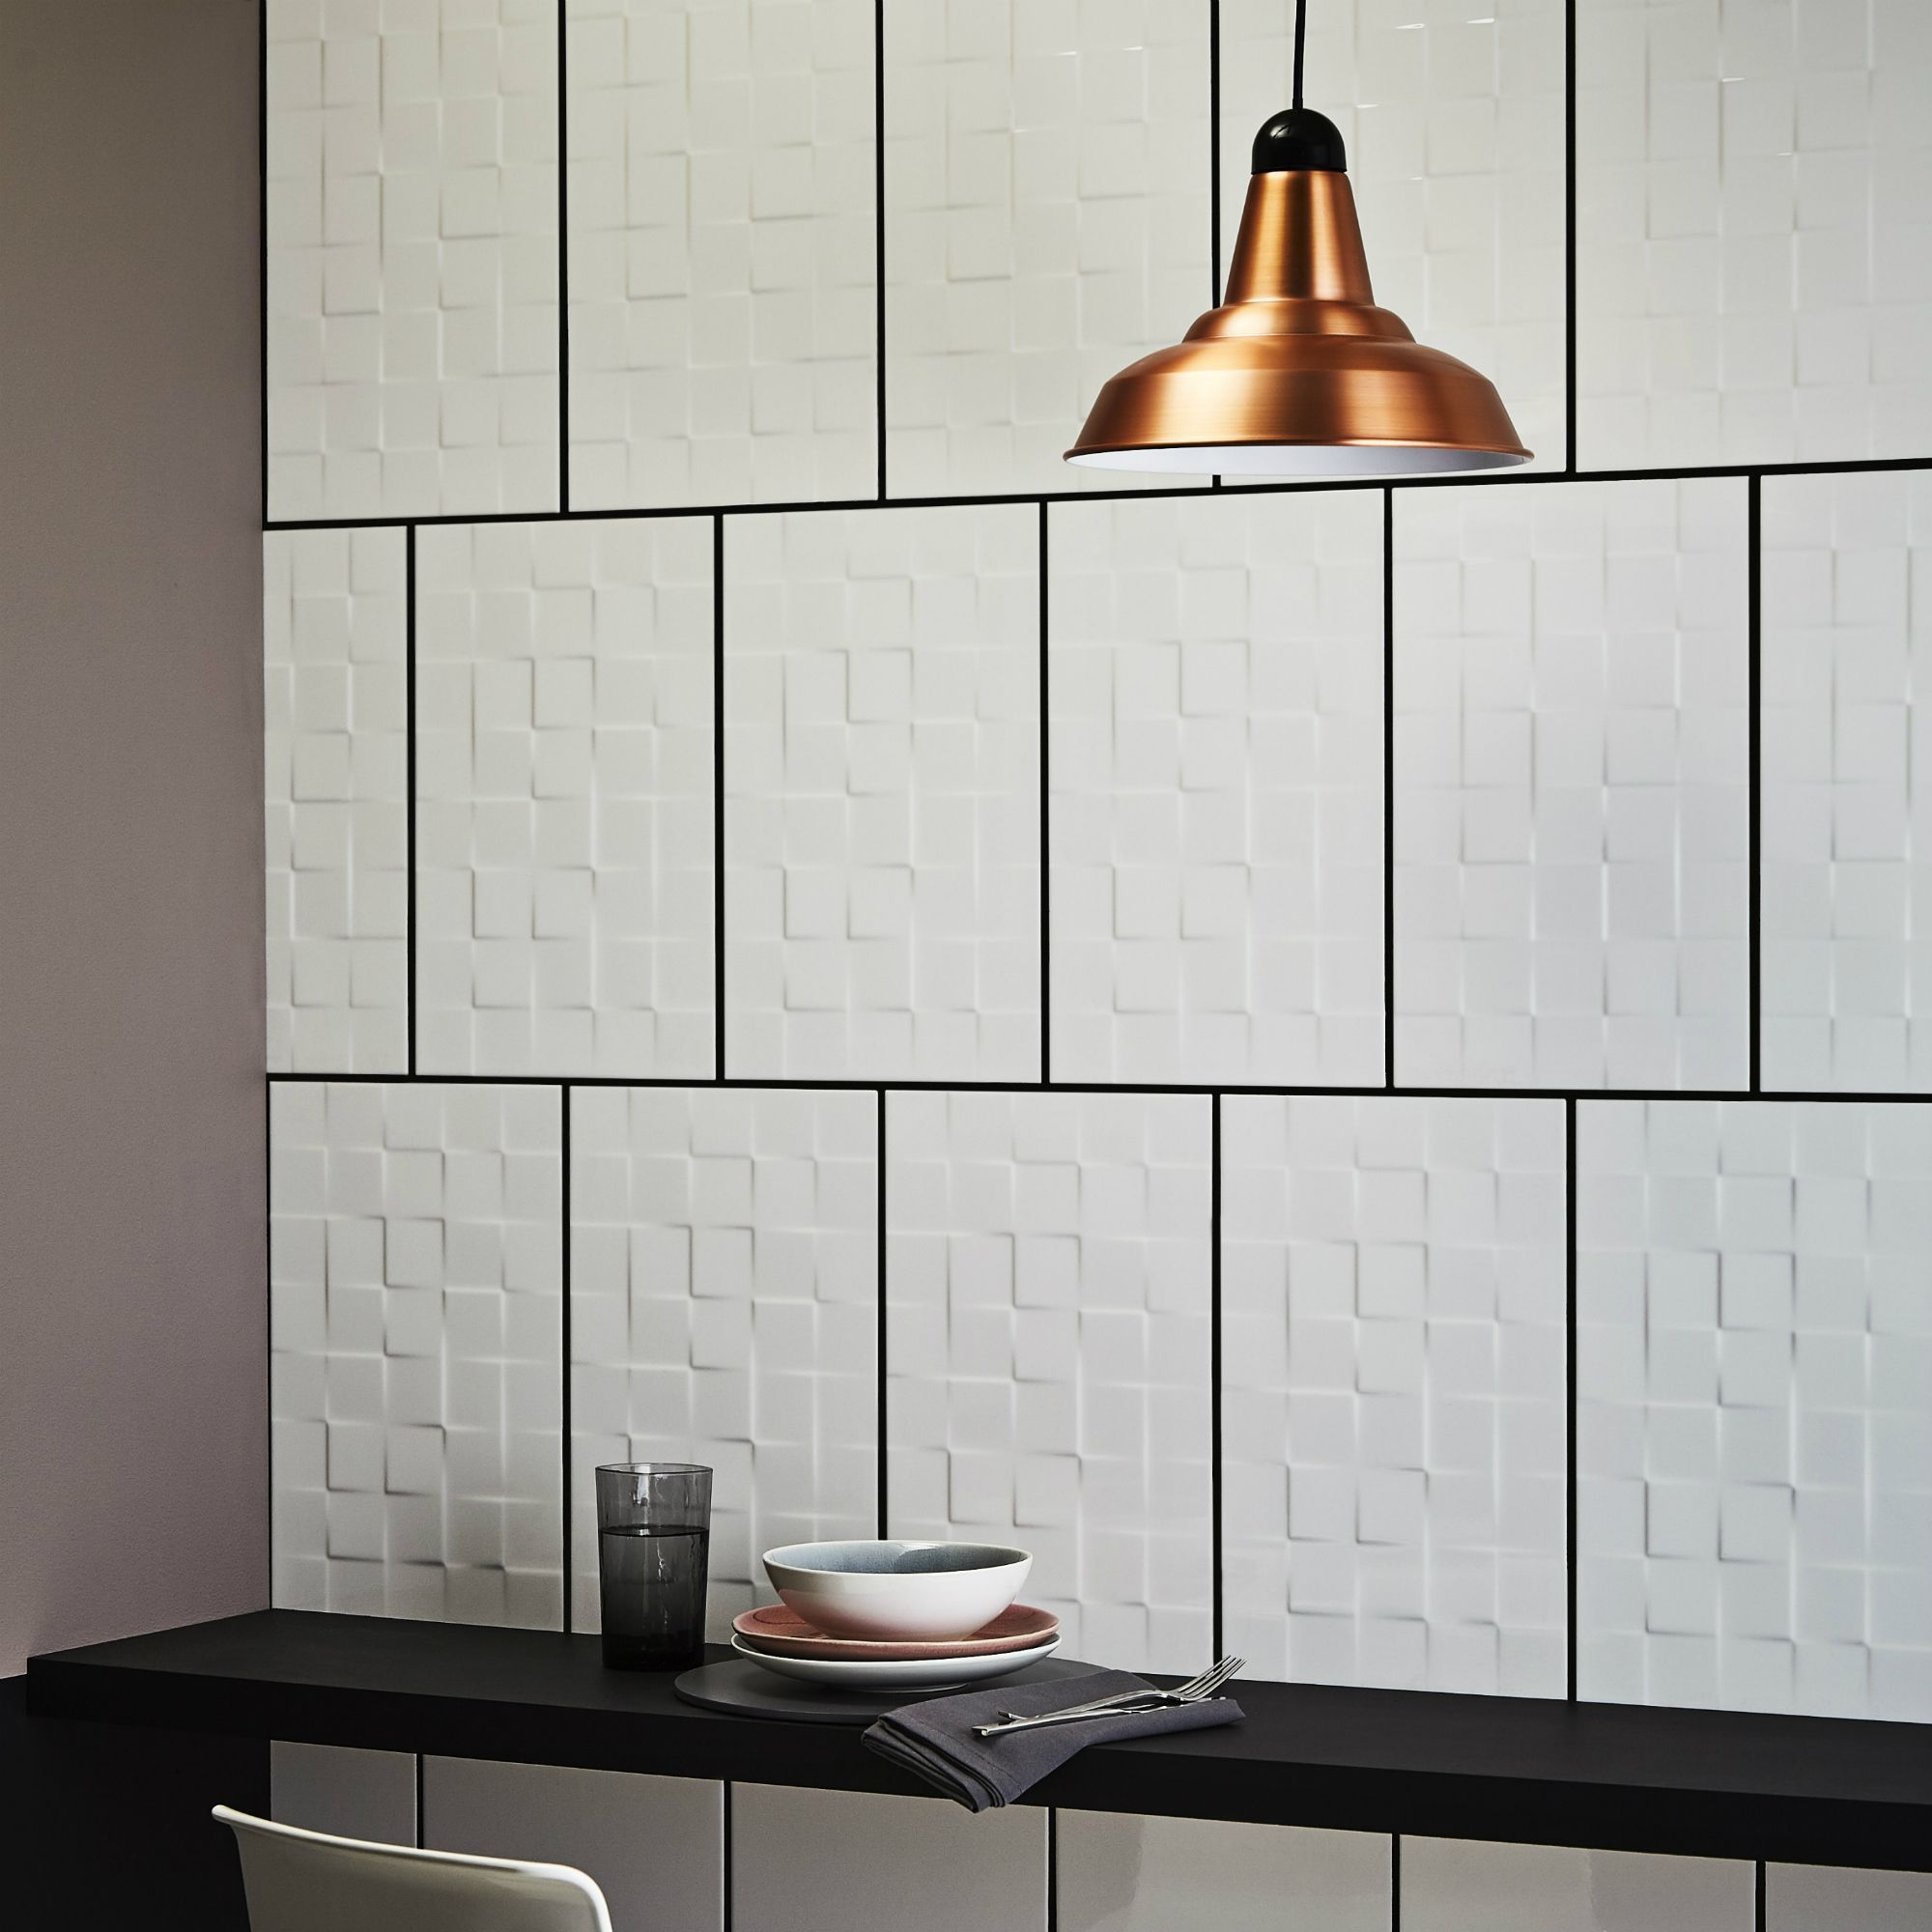 Alexandrina White Gloss Square Ceramic Wall Tile Sample Ceramic Wall Tiles Wall Tiles White Wall Tiles